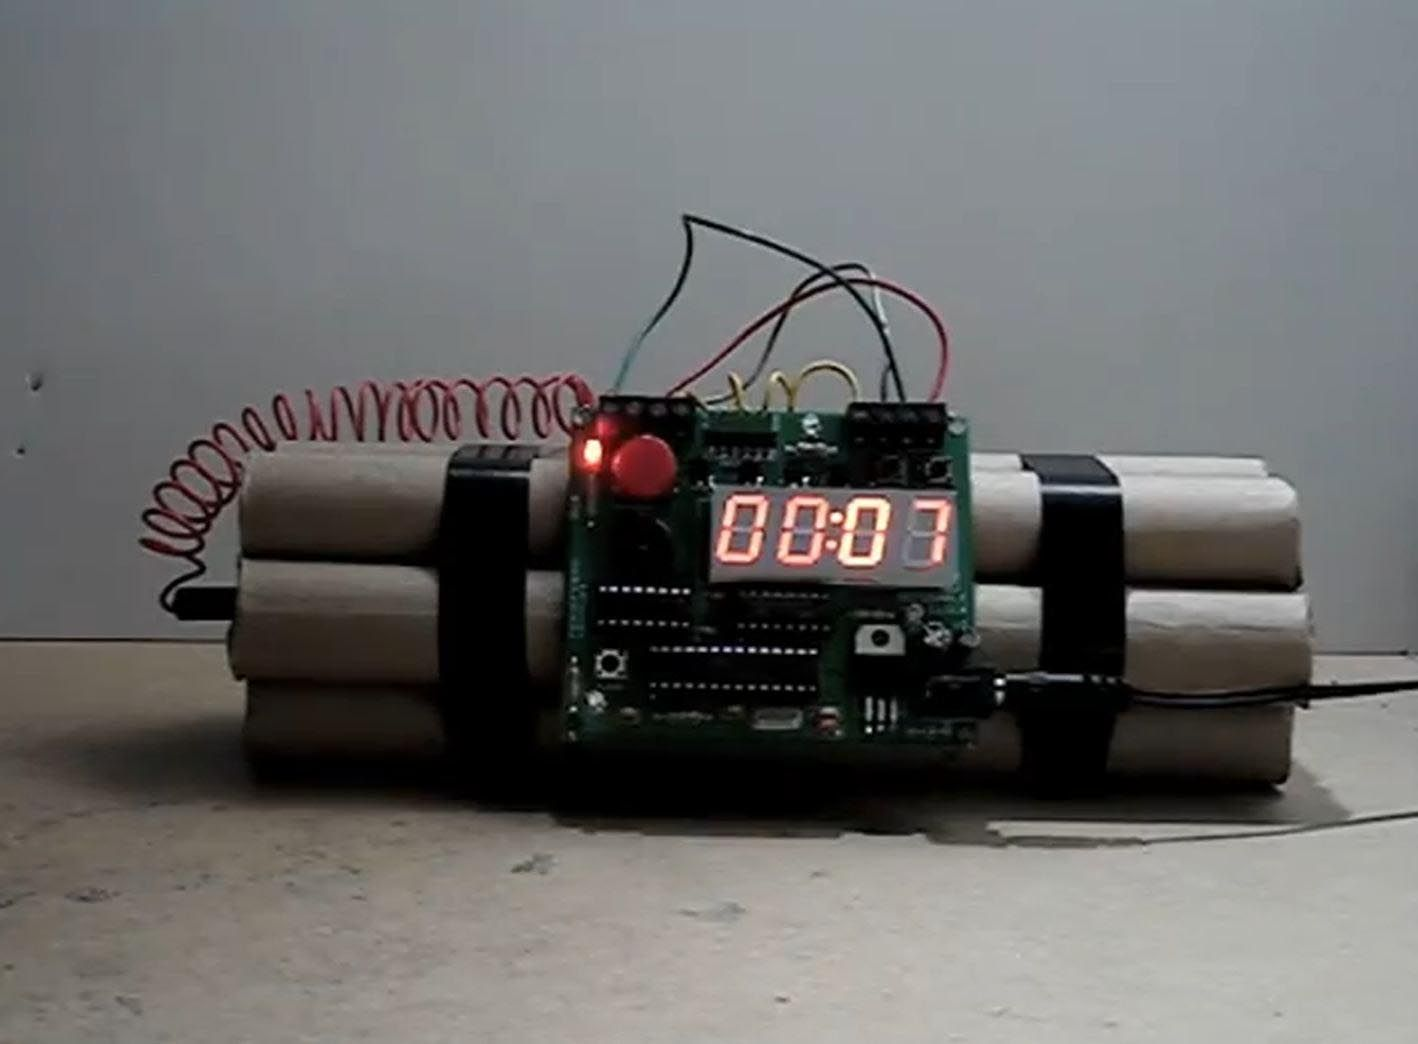 Cool Digital Alarm Clocks